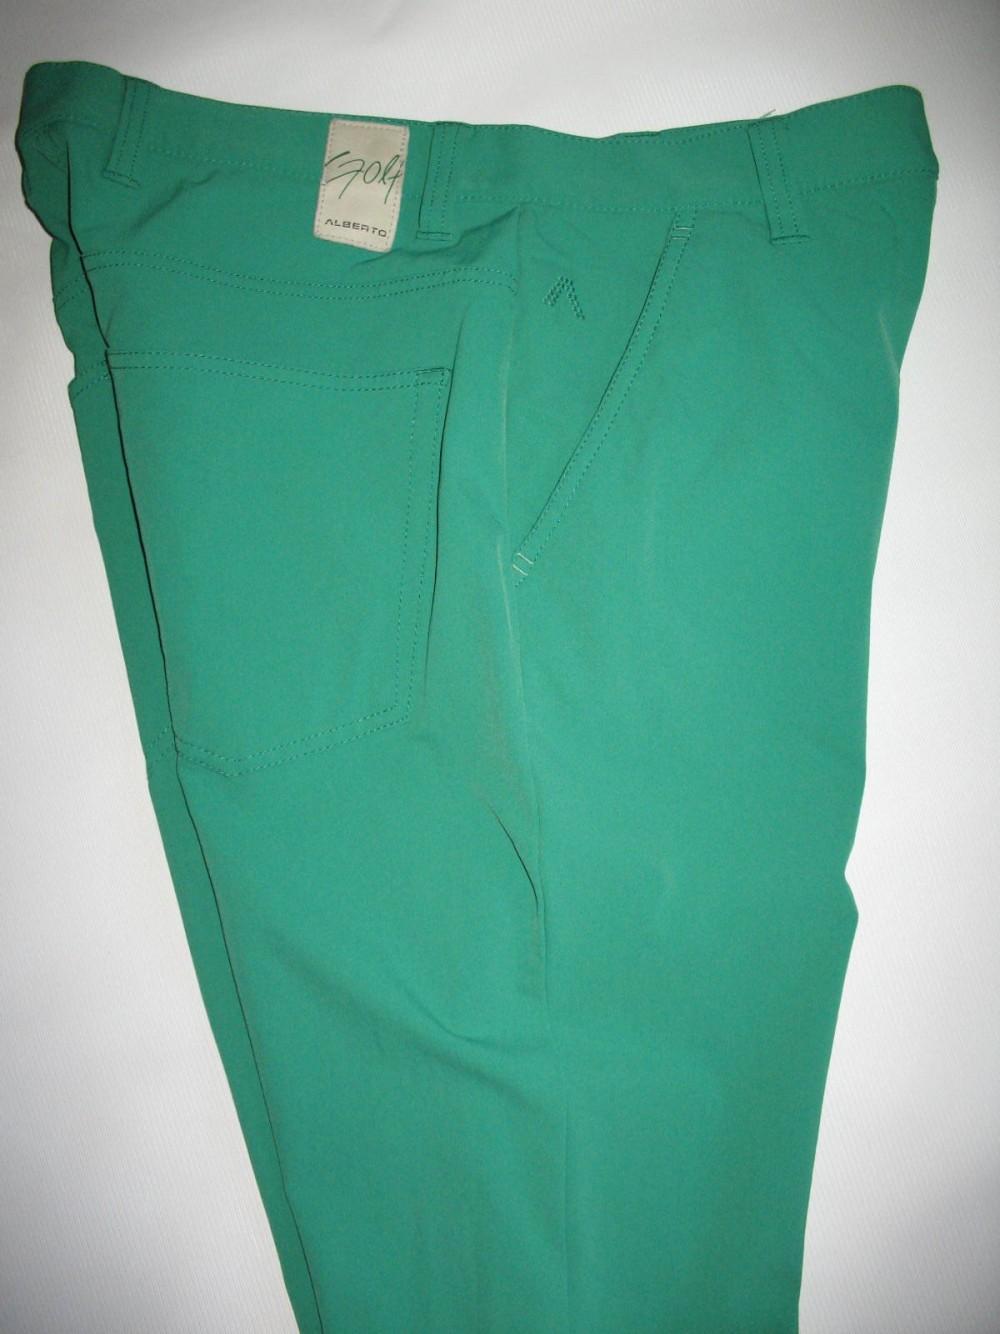 Штаны ALBERTO pro 3XDRY cooler pants (размер 48/M) - 4